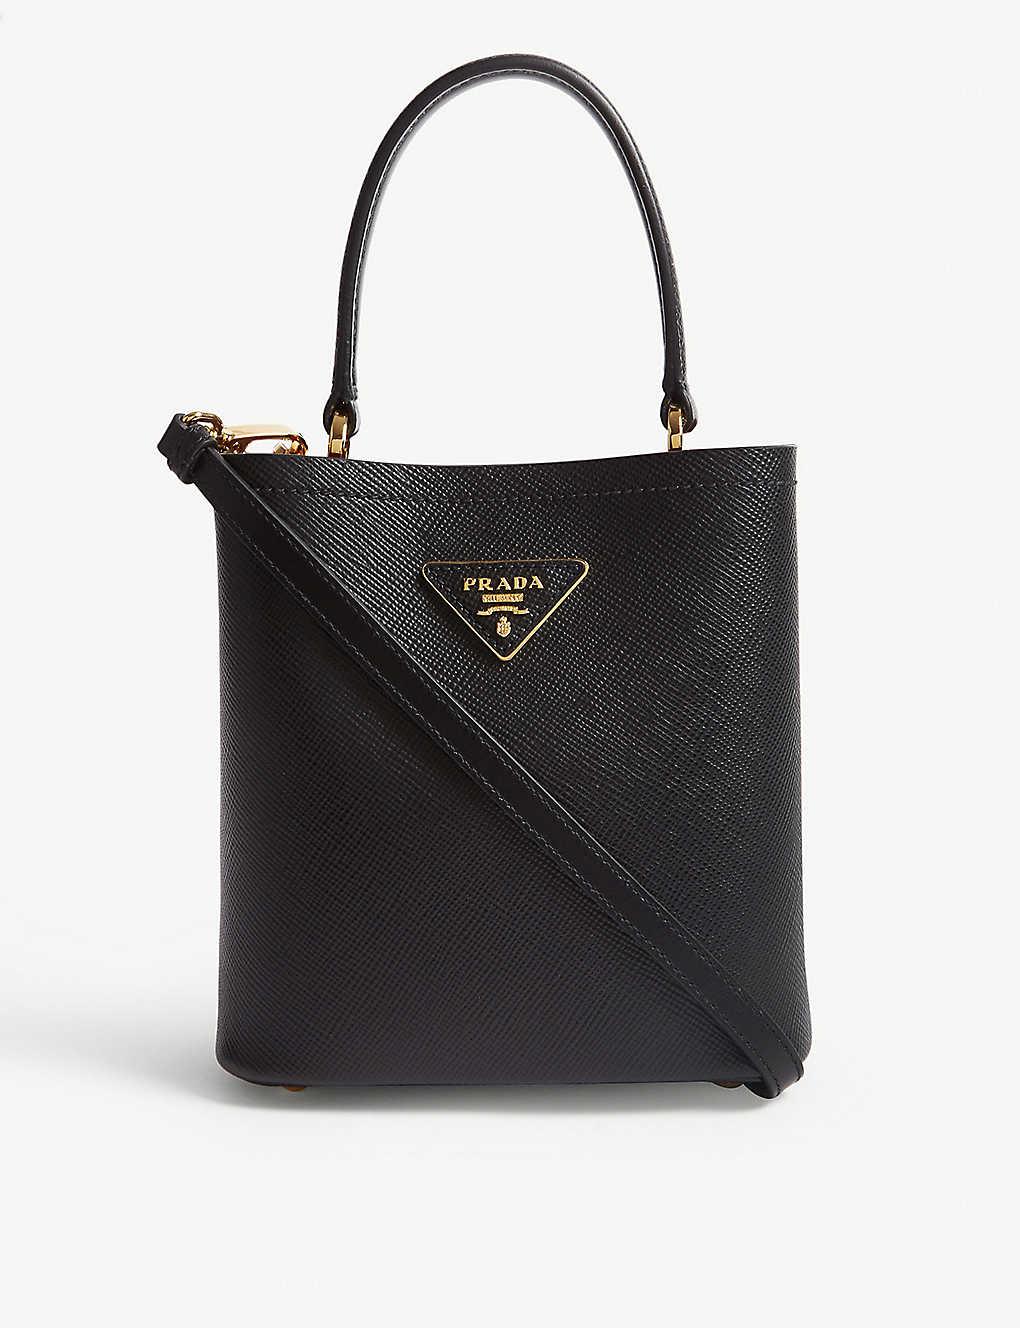 17899ef49b7b PRADA - Mini leather bucket bag | Selfridges.com